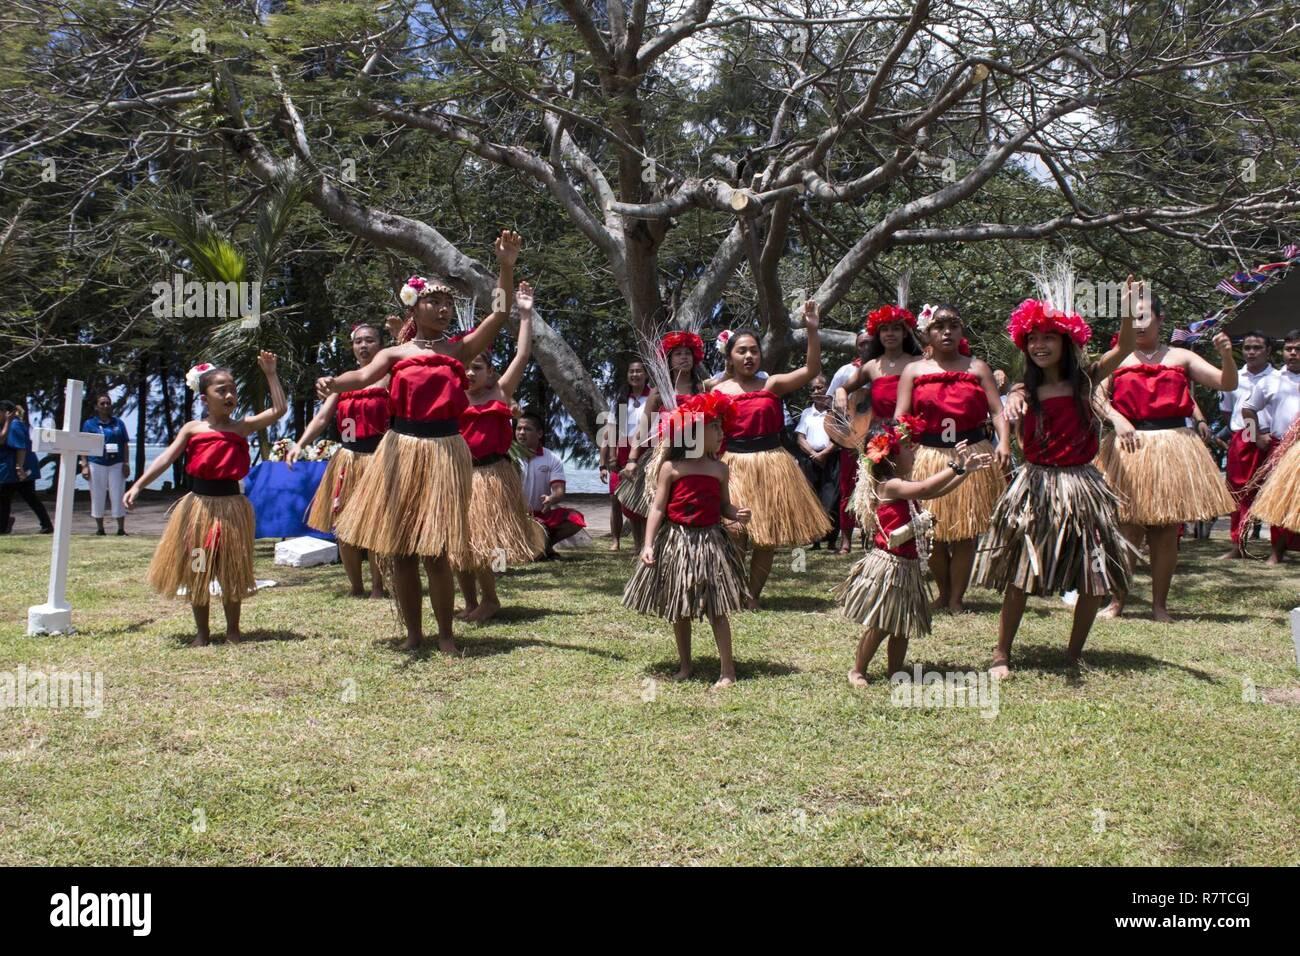 HAGÅTÑA, Guam (April 7, 2017) -- A local Chamorro dance